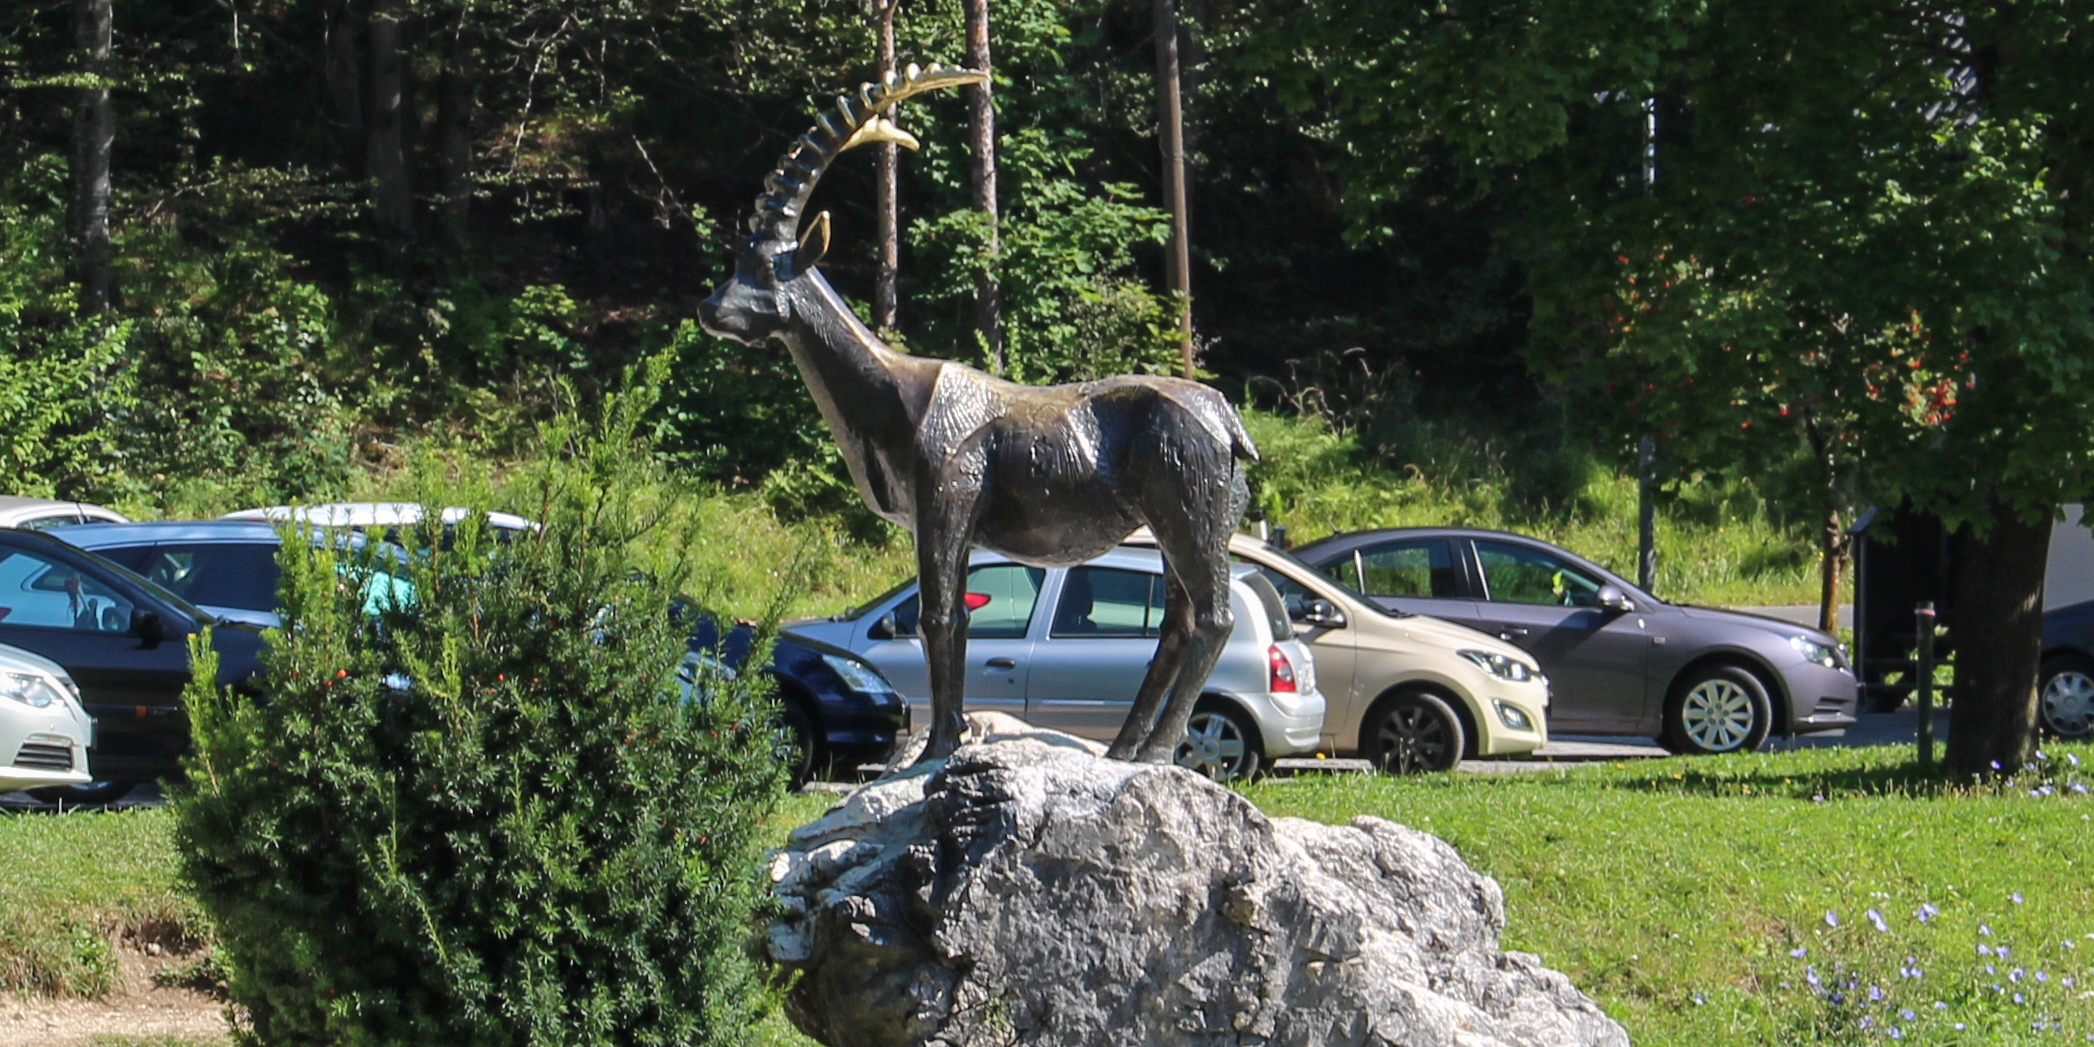 pomnik Zlatoroga - symbol słoweńskich Alp Julijskich